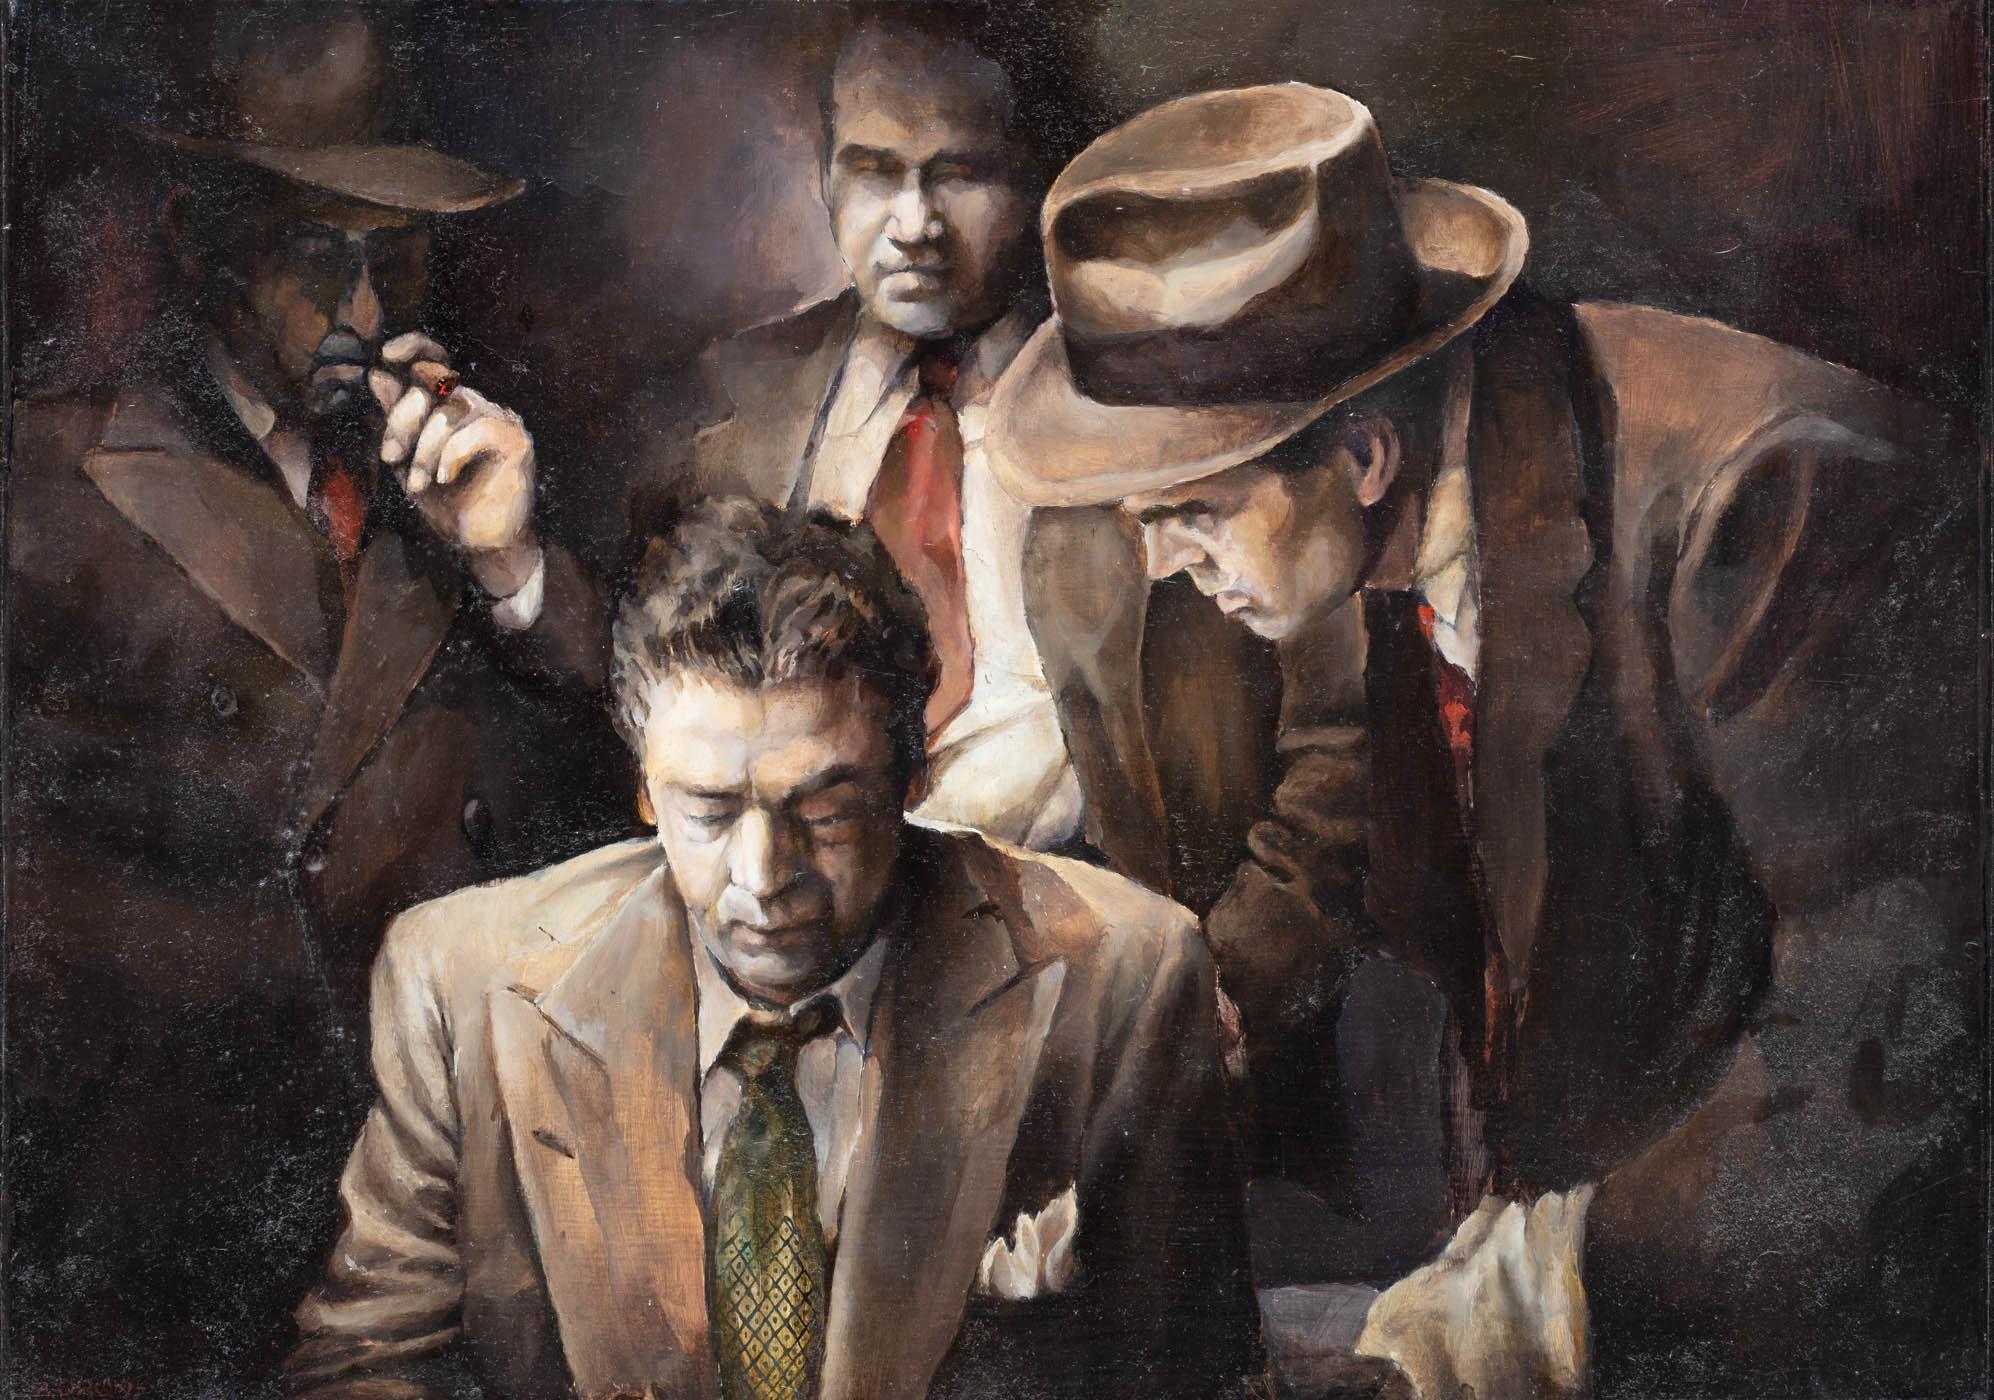 Interrogators, 2016